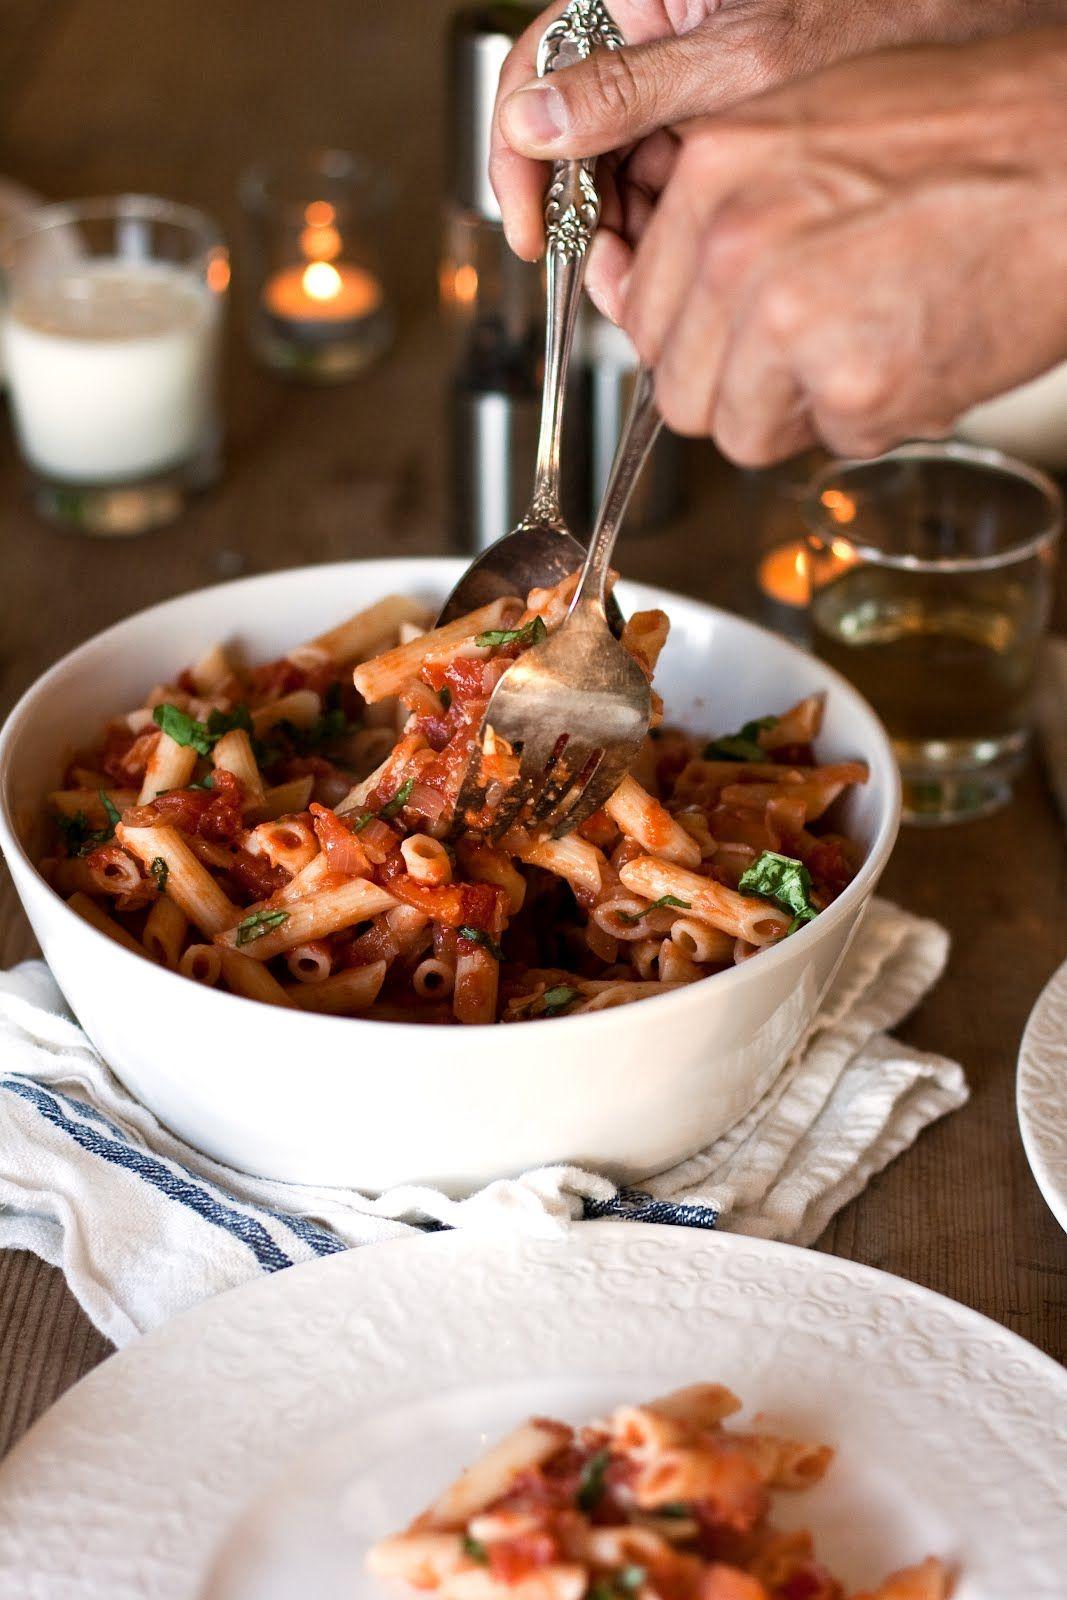 keep it simple, keep it fresh: roasted garlic pasta/ a family favorite